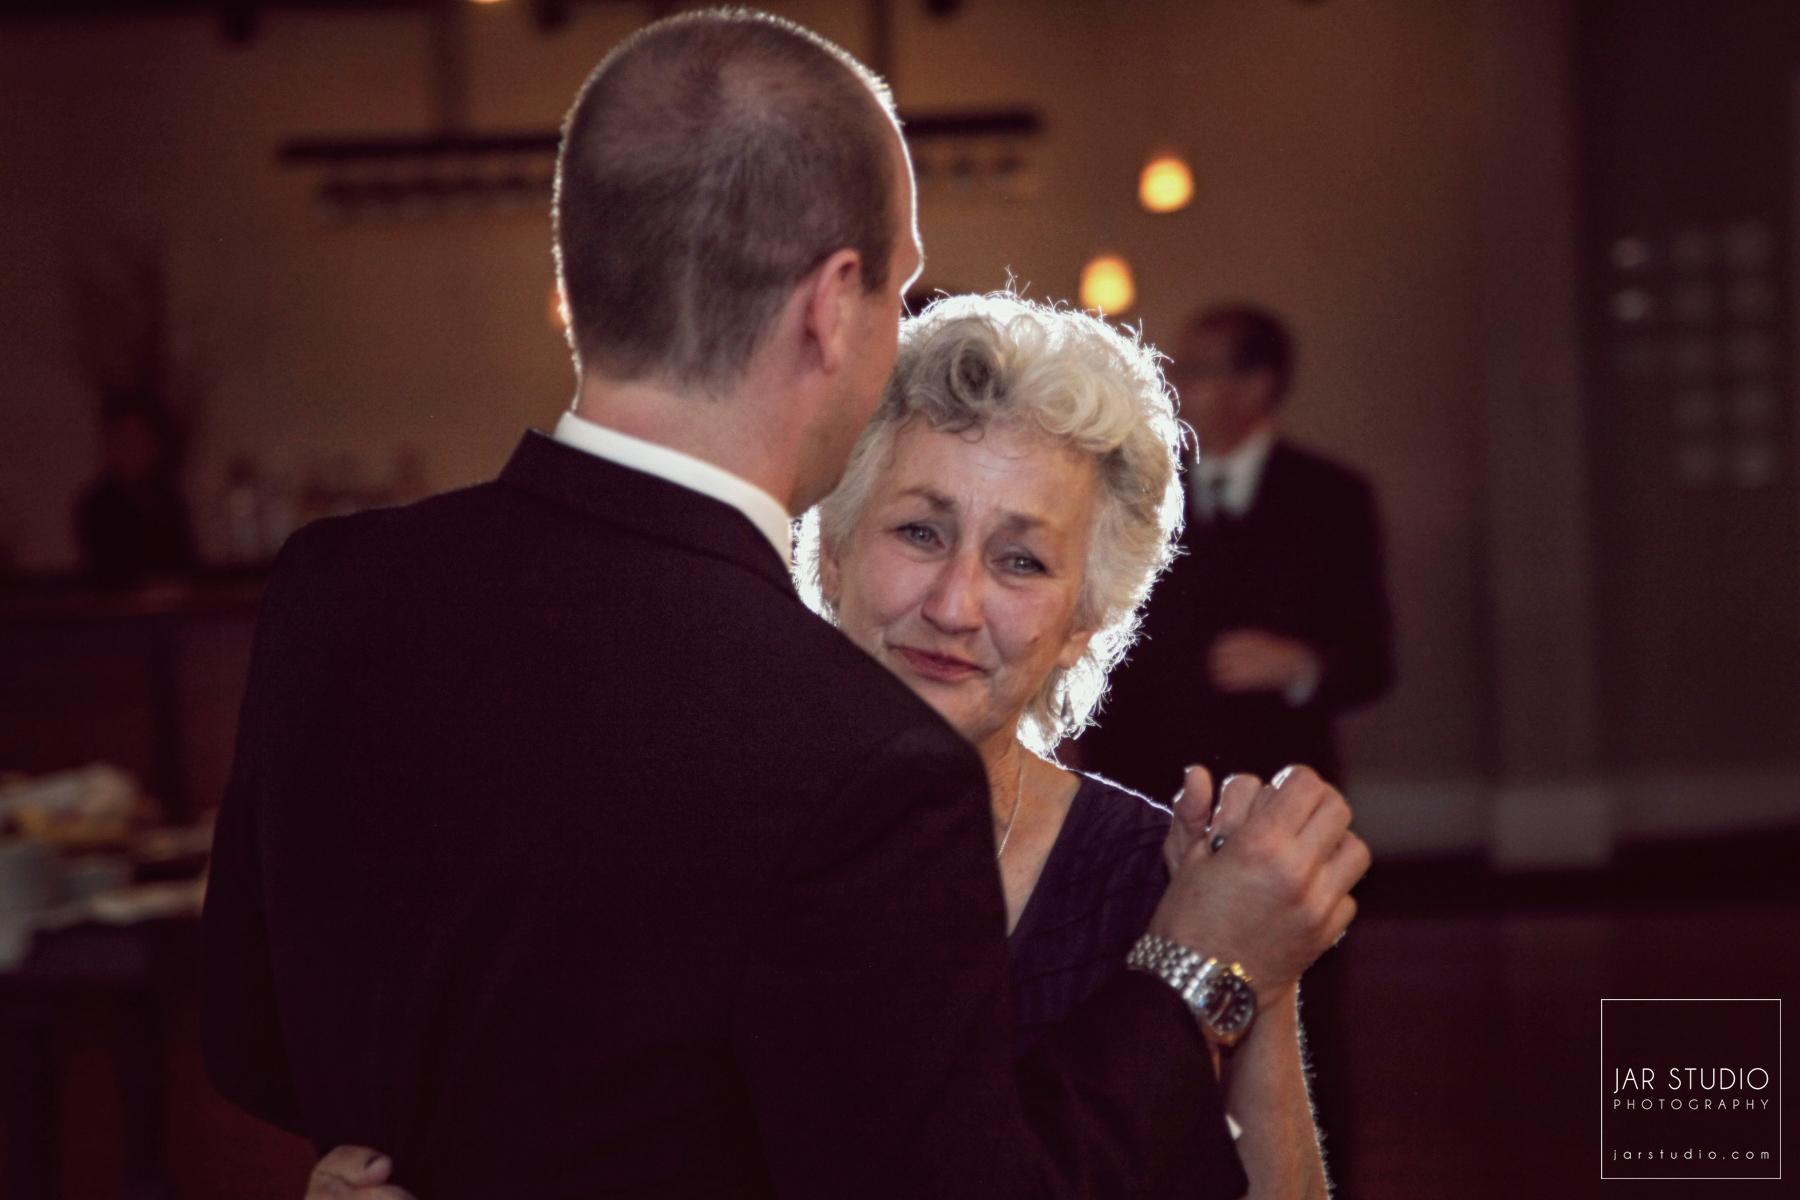 26-mother-son-dance-jarstudio-photography.JPG